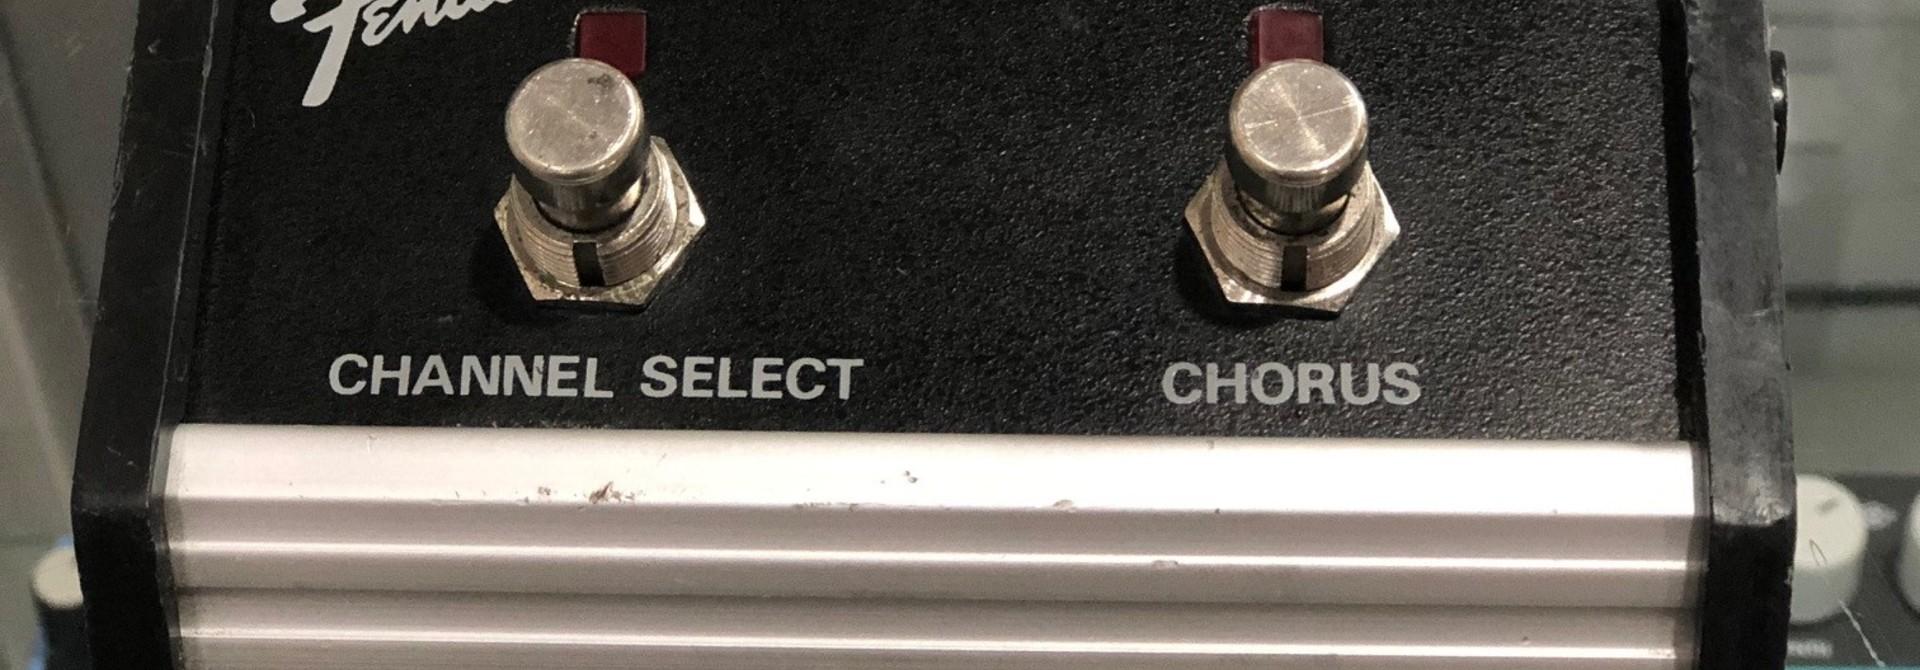 Fender Channel Selector w/ chorus switch